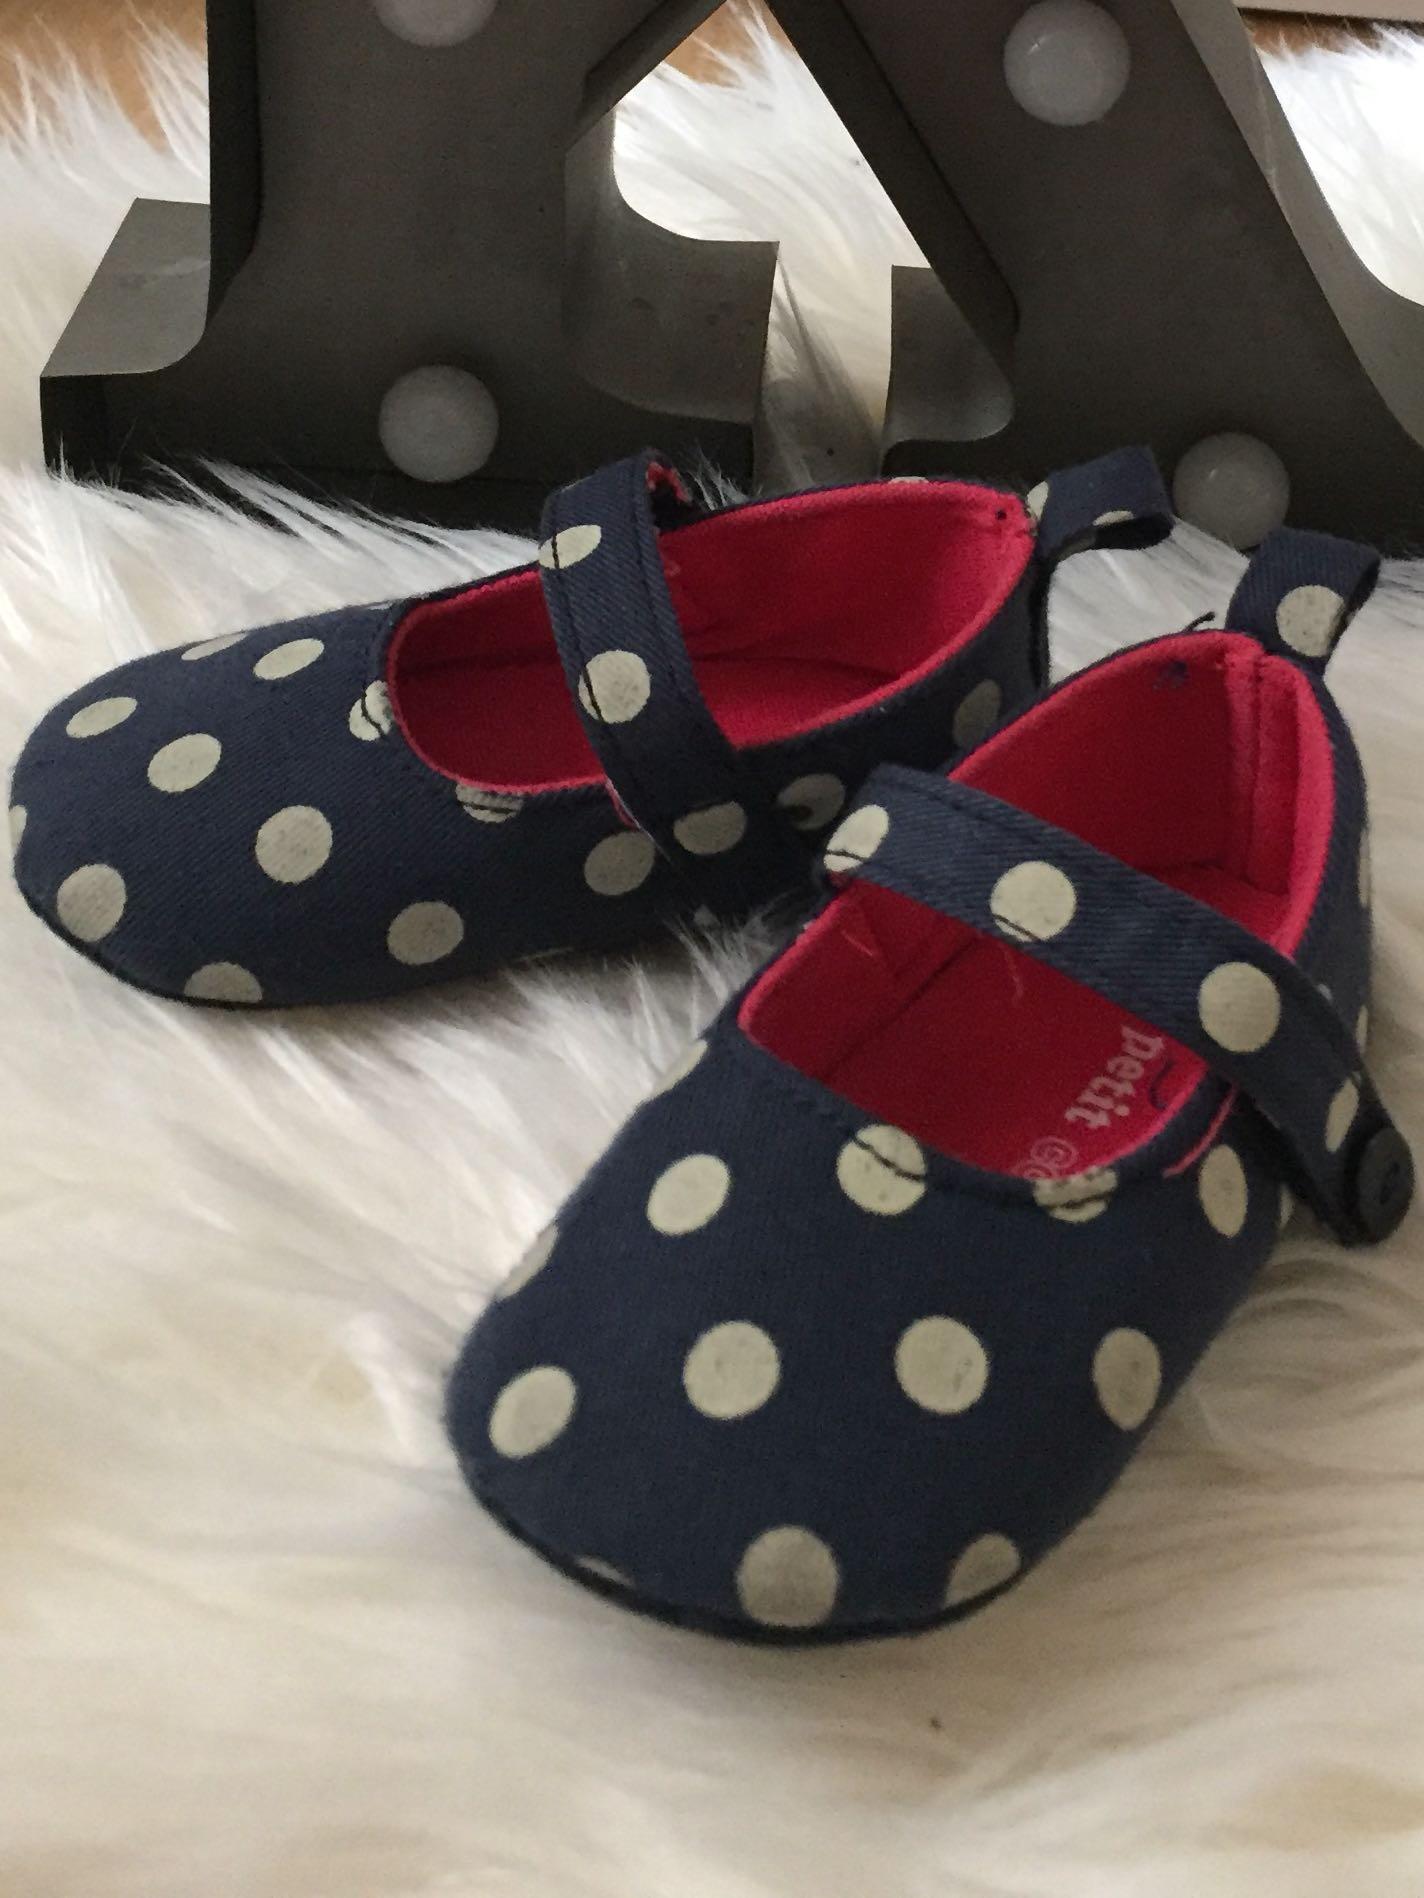 Baby Girl Prewalker Shoes sz 2    Sepatu Bayi, Babies & Kids, Babies Apparel on Carousell